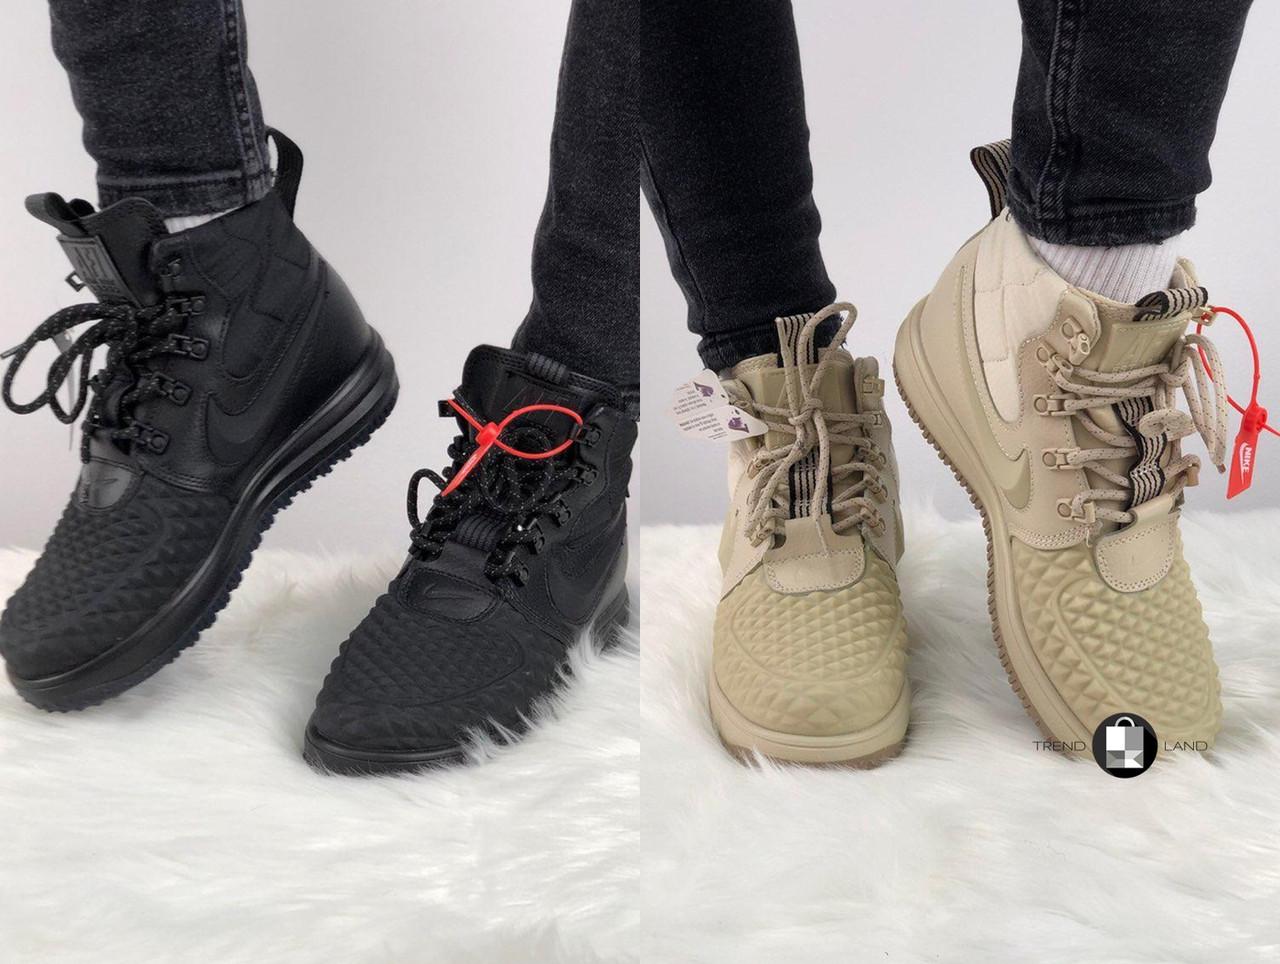 8bb52215 Женские термо кроссовки/ботинки в стиле Nike Lunar Force 1 Duckboot 2 цвета  в наличии